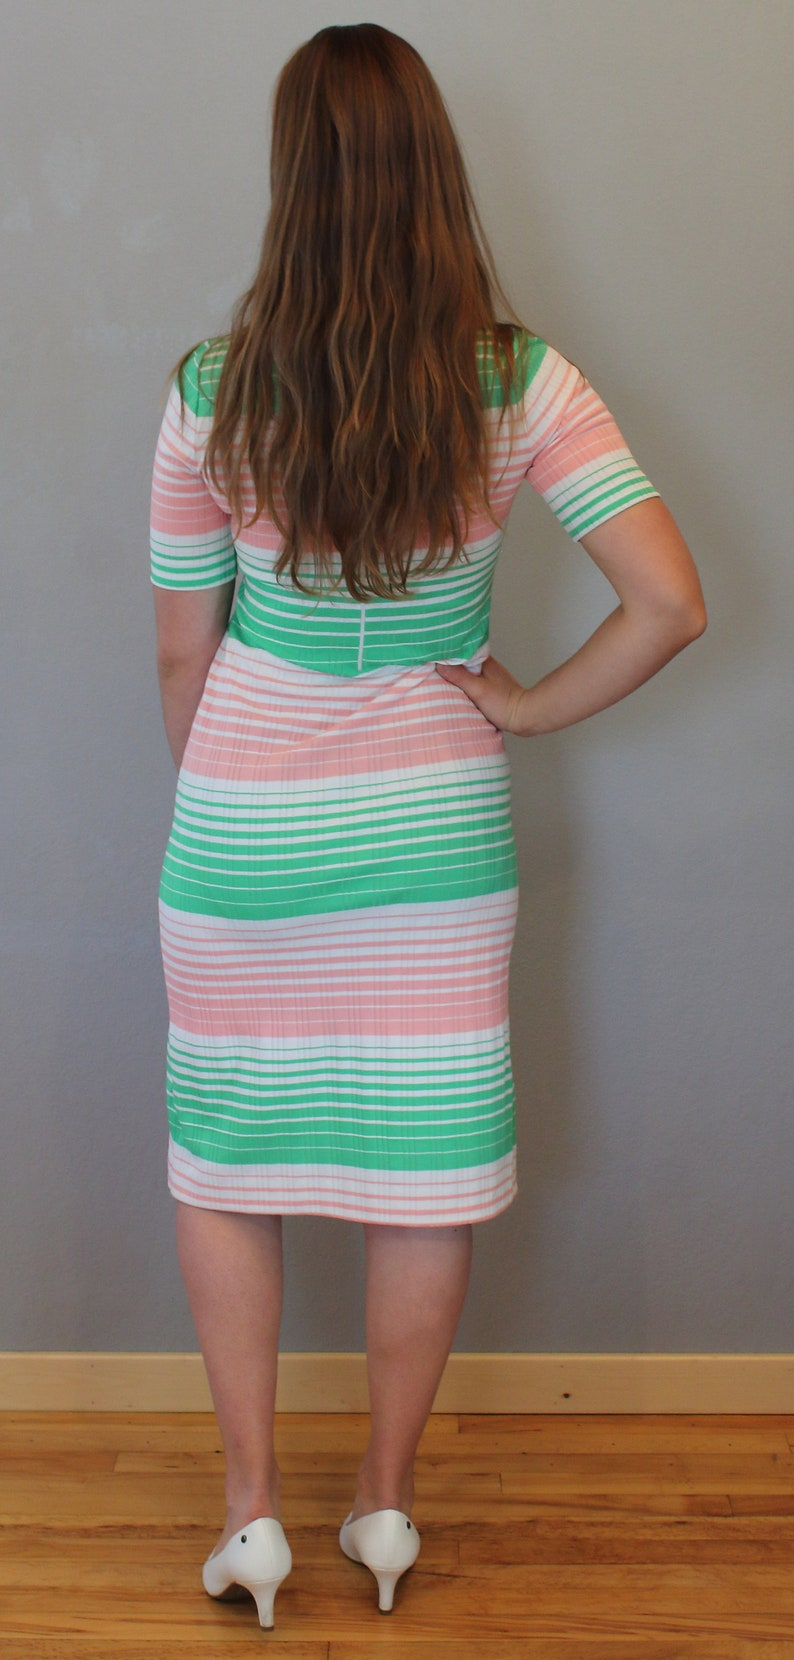 White Knit Dress Ribbed Mock Neck 60/'s Vintage Mod Striped Dress Pink Green